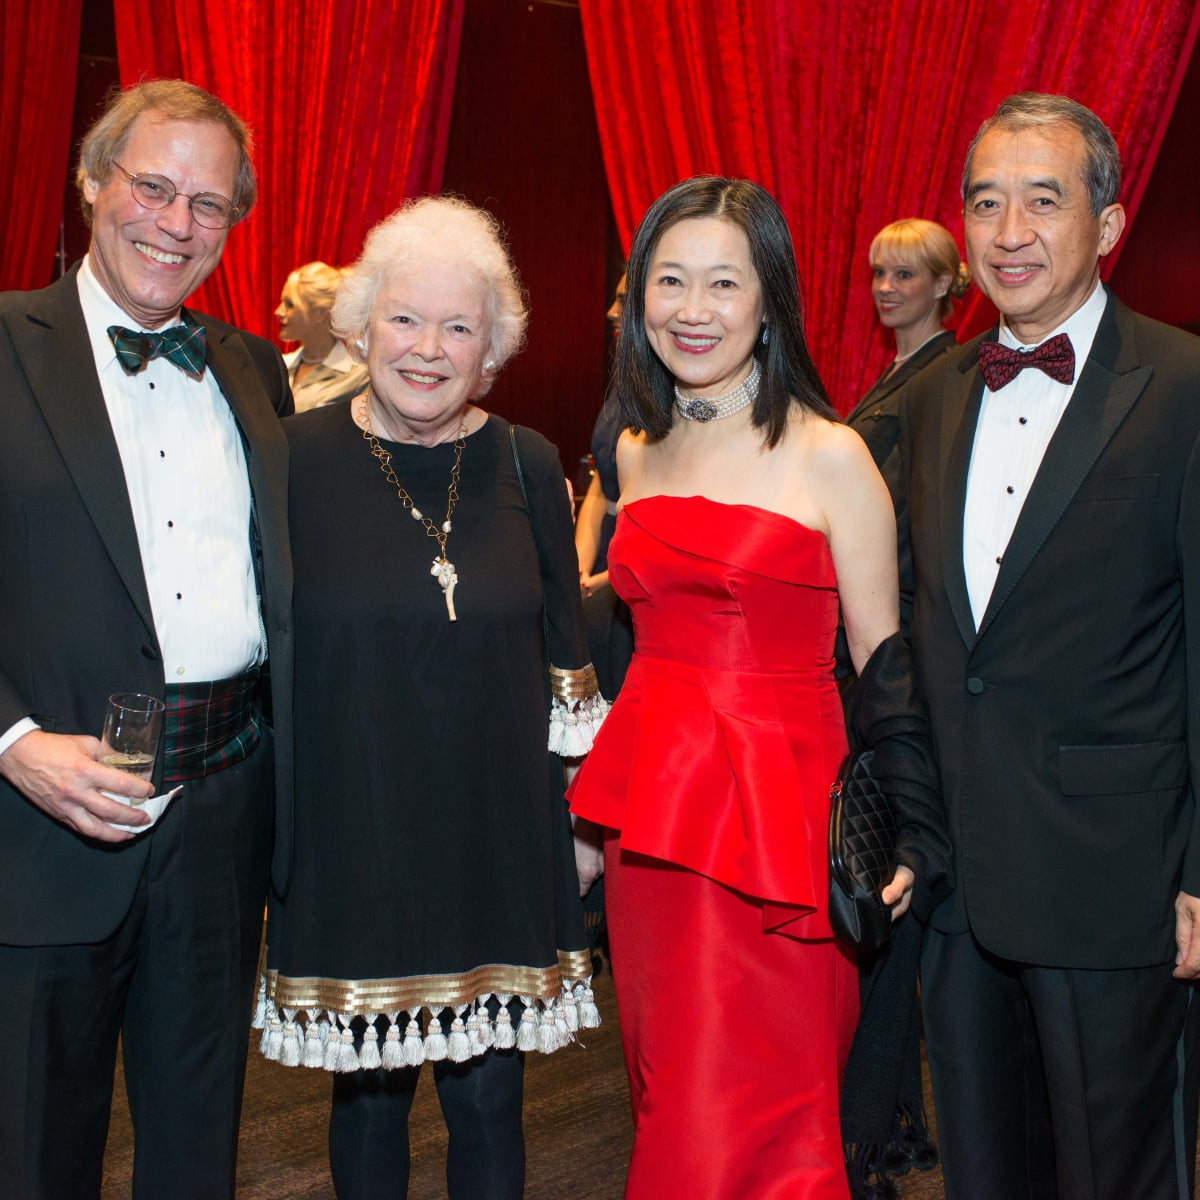 Red Cross Ball, Feb. 2016, Stephen Klineberg, Peggy Klineberg, Anne Chao, Albert Chao